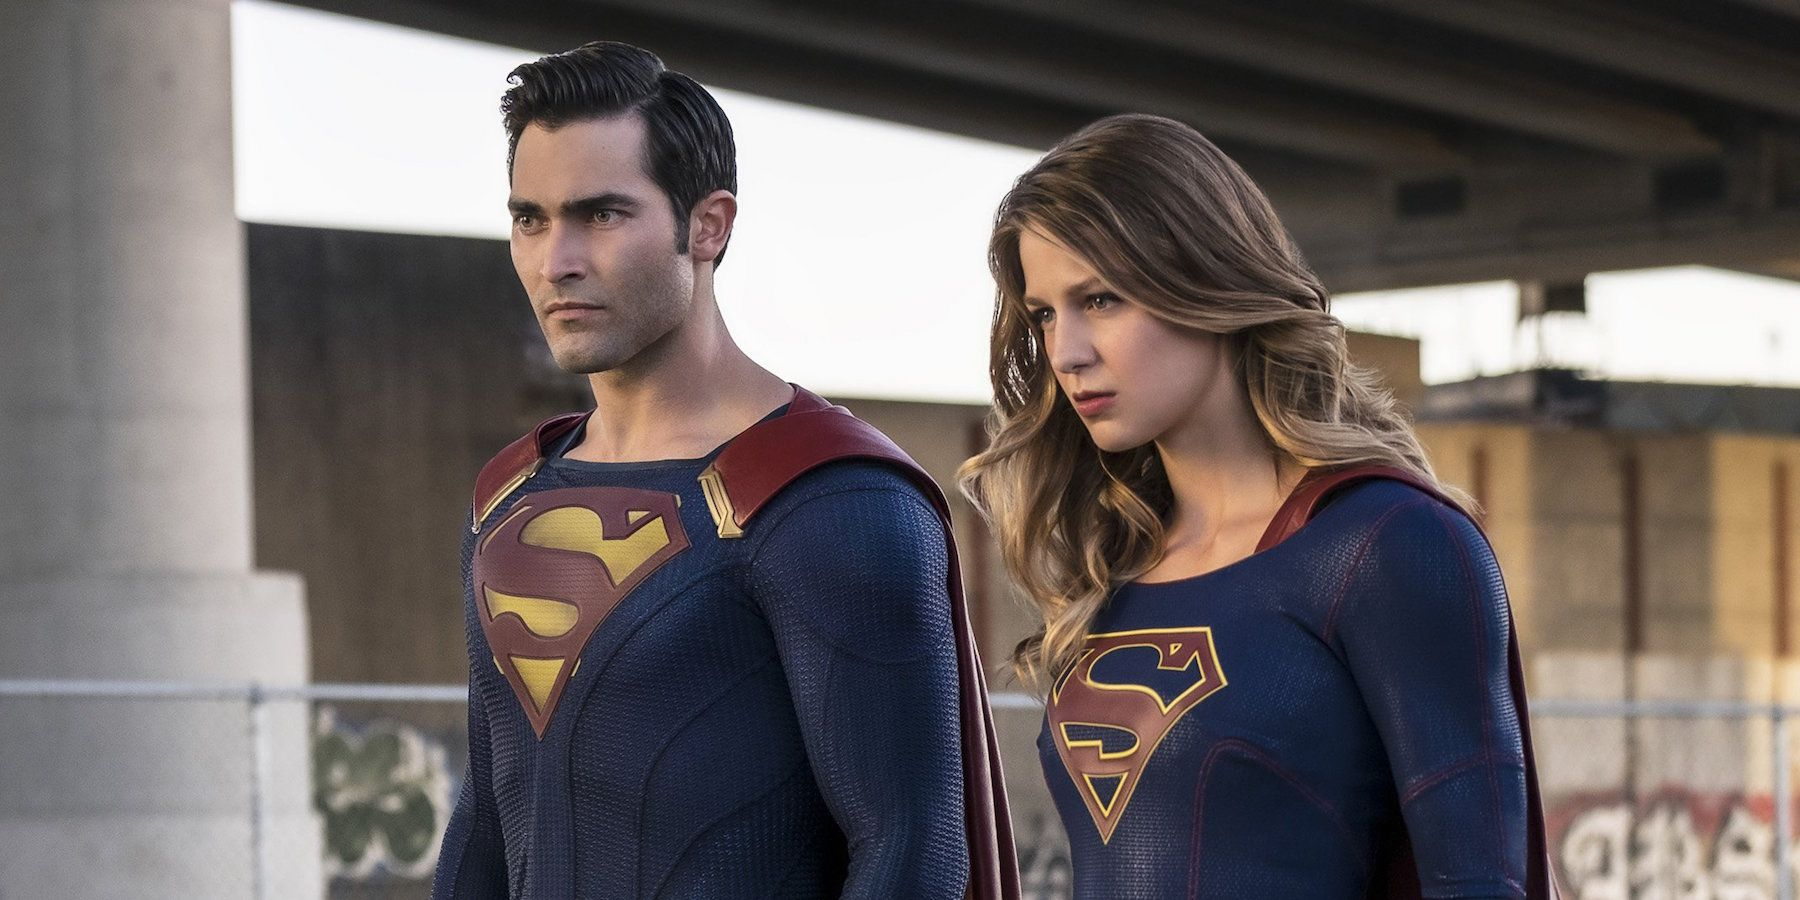 supergirl season 2, episode 2 review oh, just give superman Supergirl Season 2 Start